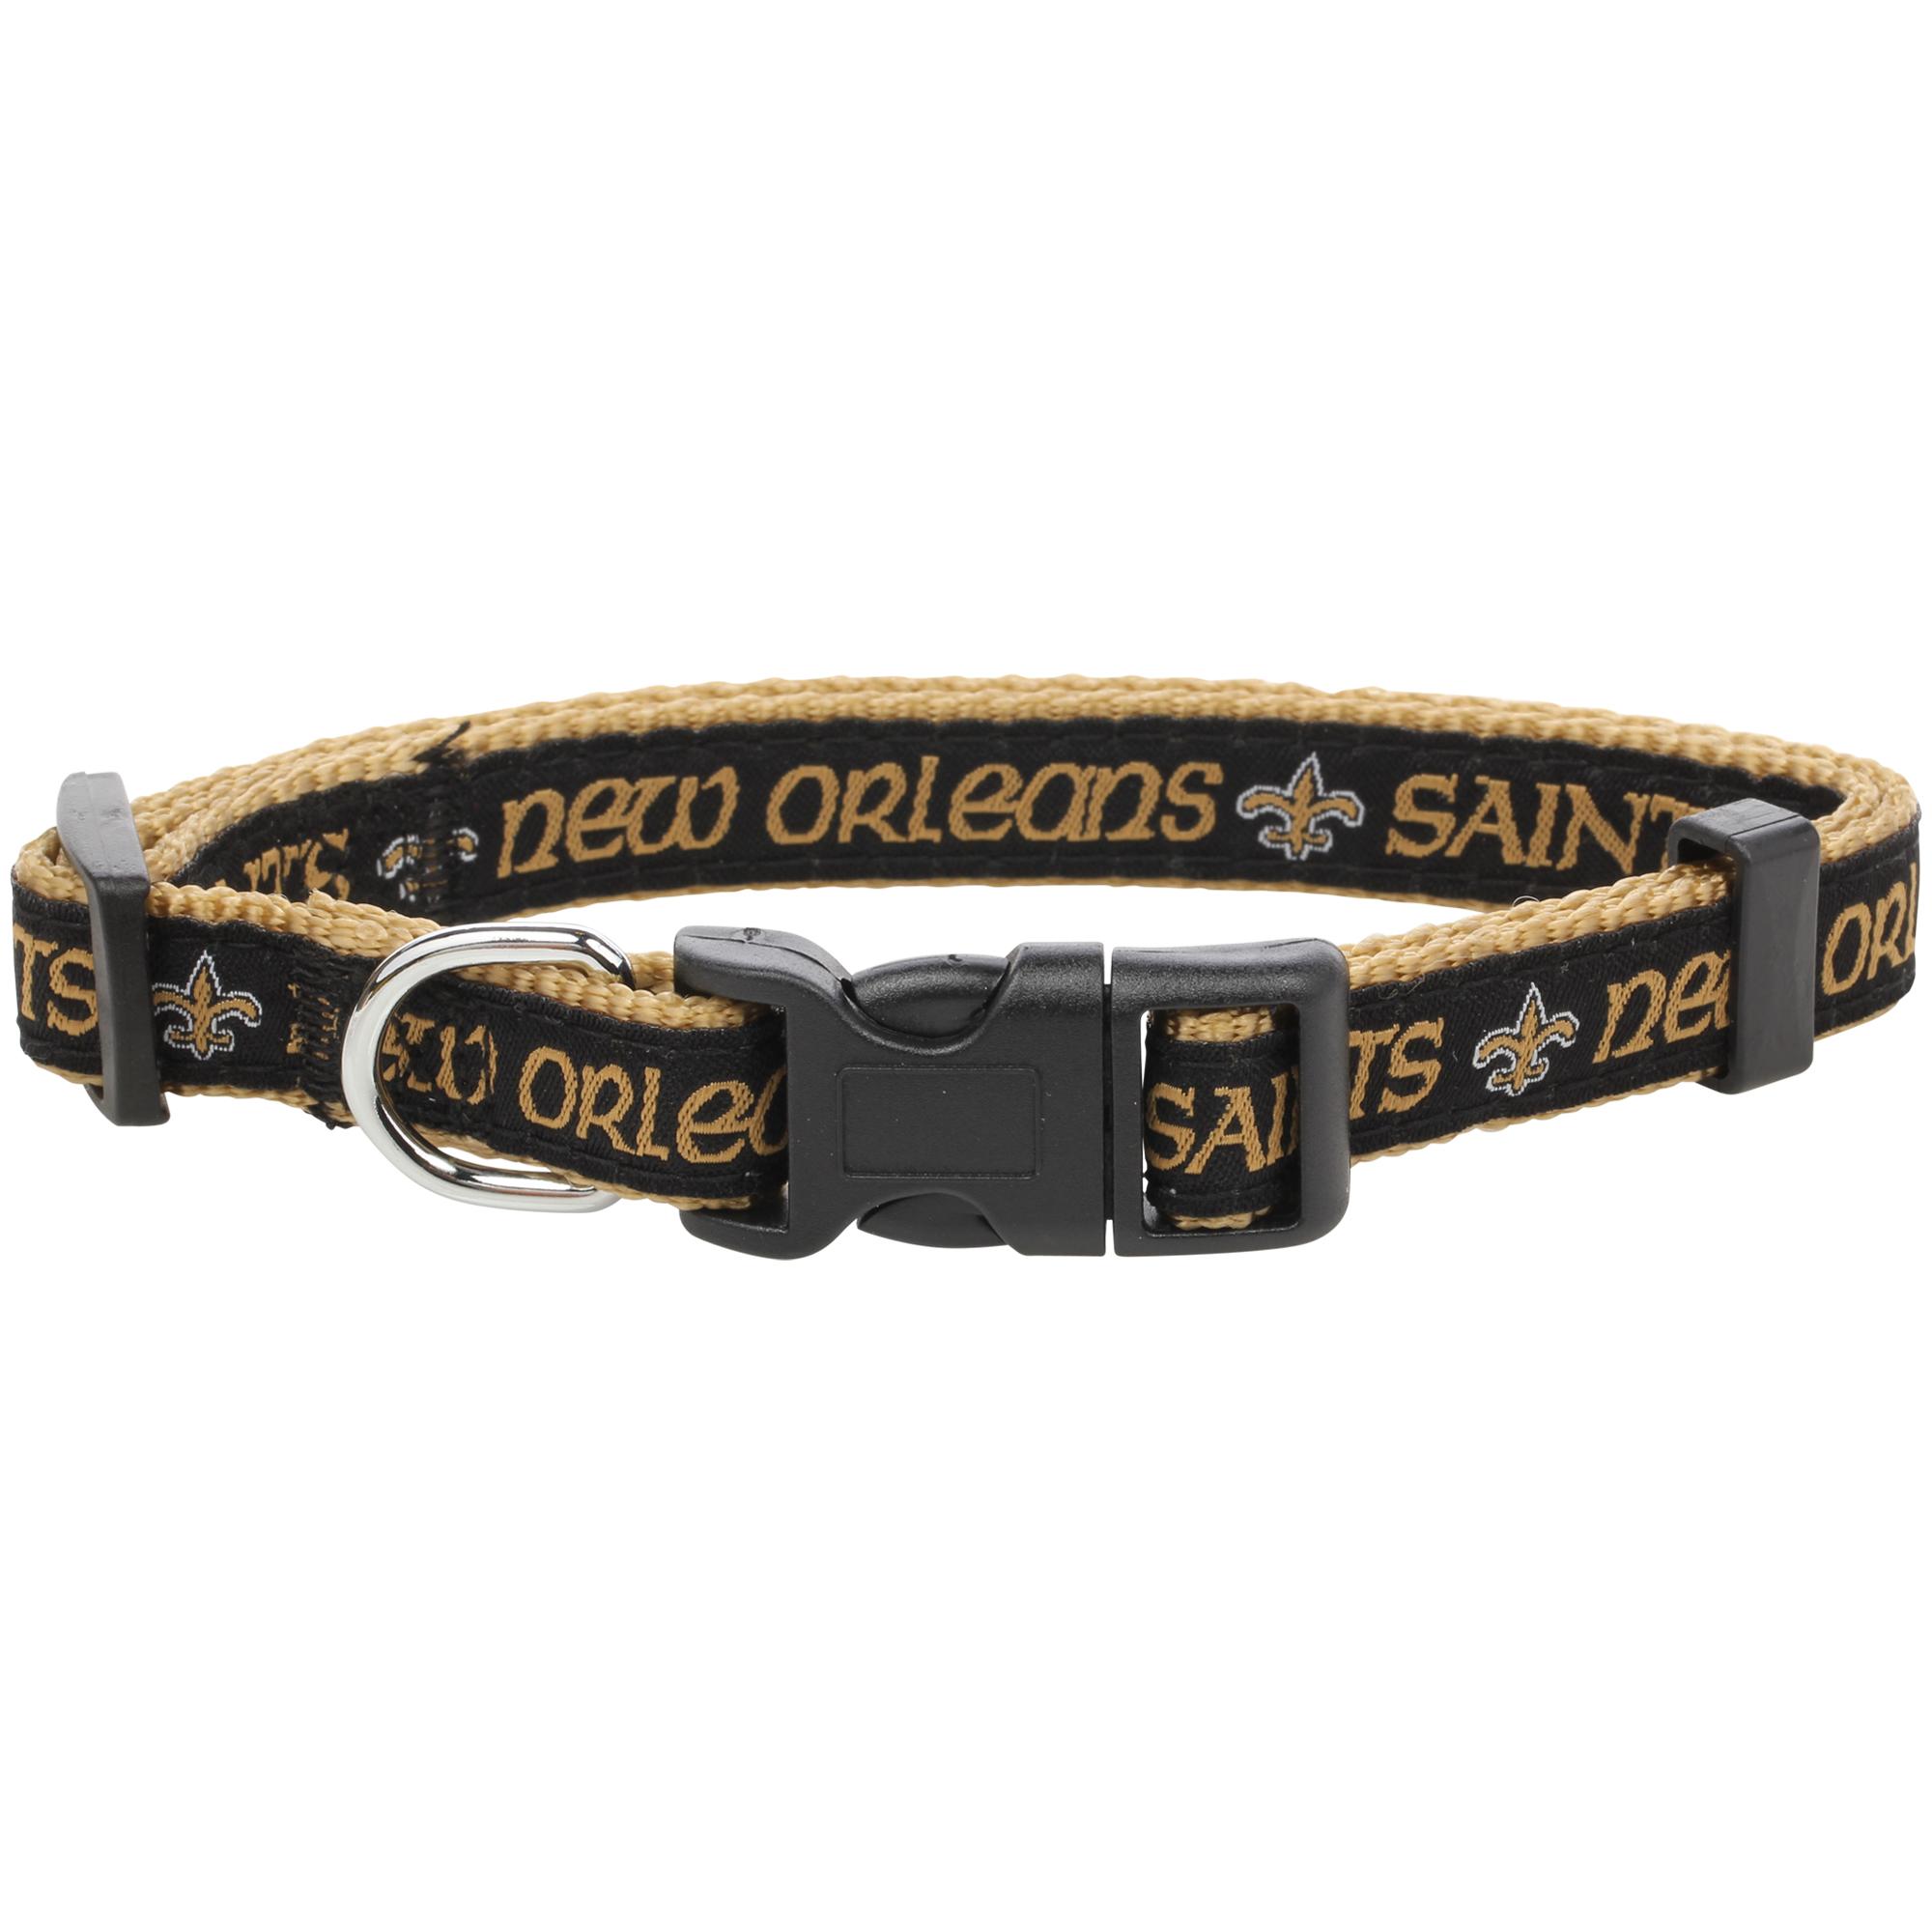 New Orleans Saints Collar